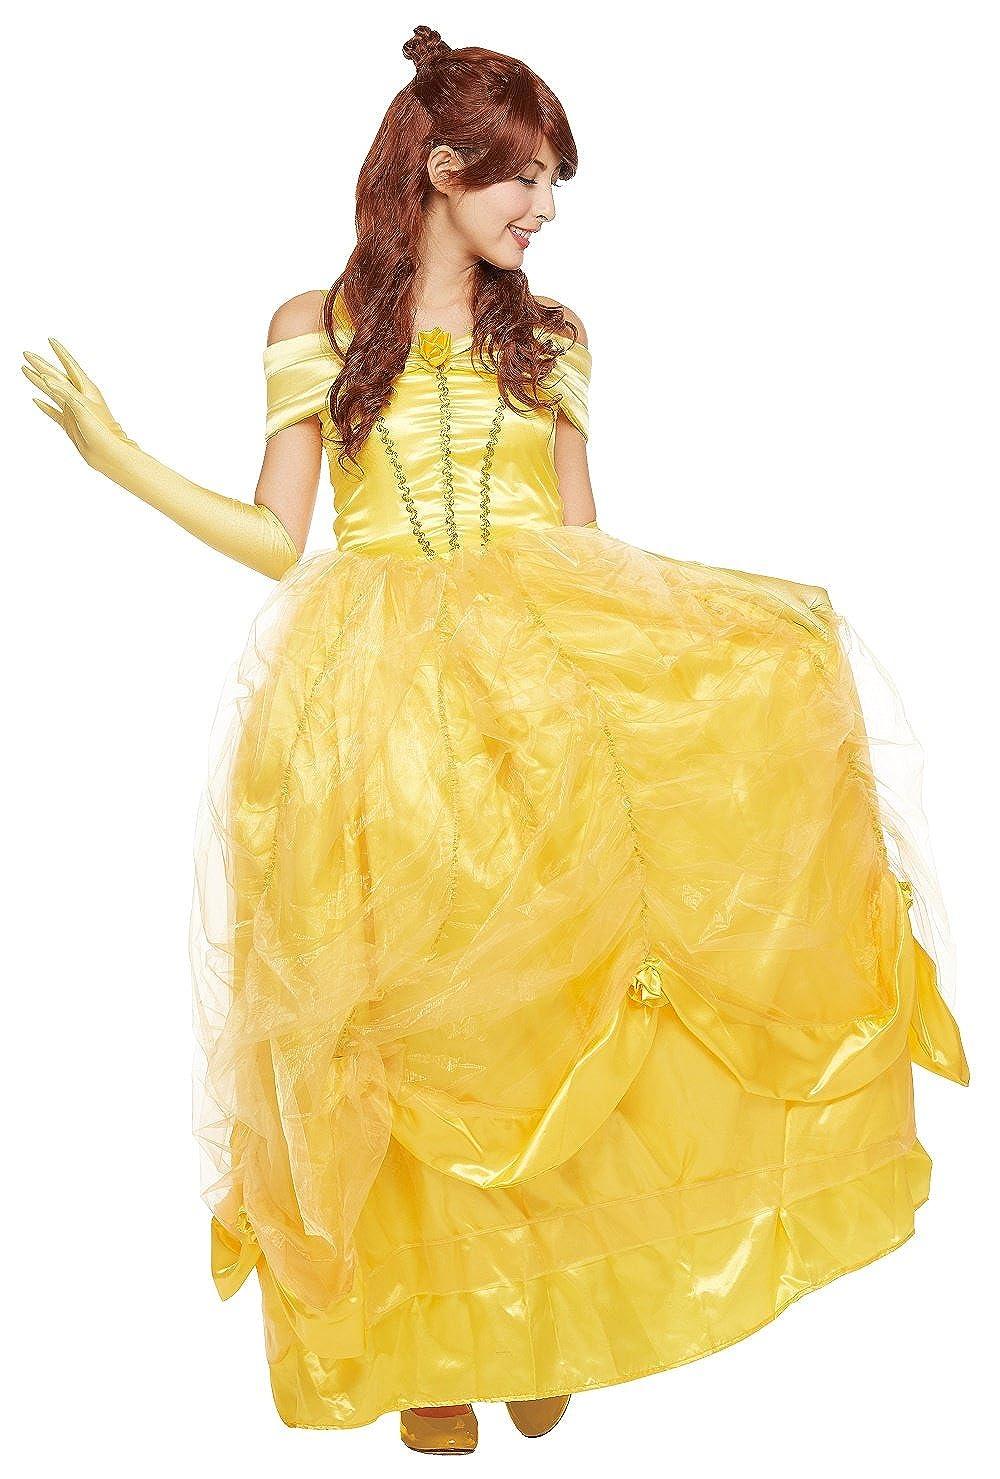 0a67ca38871 Amazon.com  Disney s Beauty   The Beast Costume - Belle Costume -  Teen Women s STD Size  Clothing